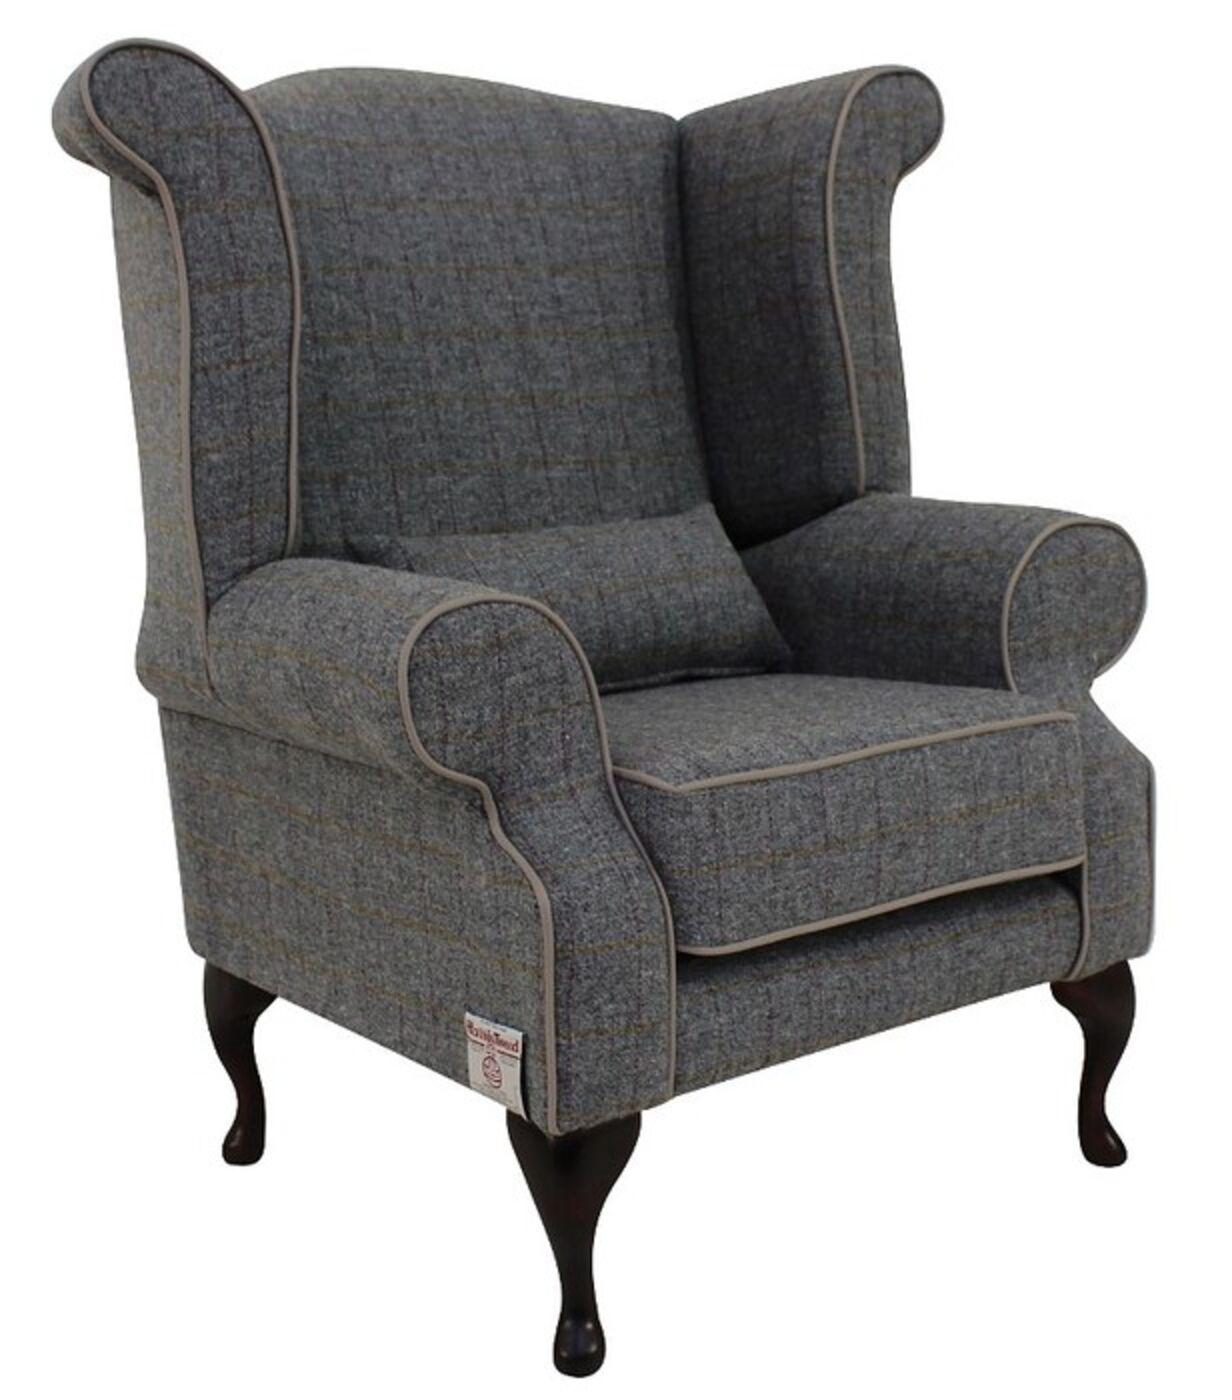 Genial Chesterfield Harris Tweed Edward Queen Anne Wool Wing Chair Fireside High  Back Armchair Huntsman Check Slate Grey